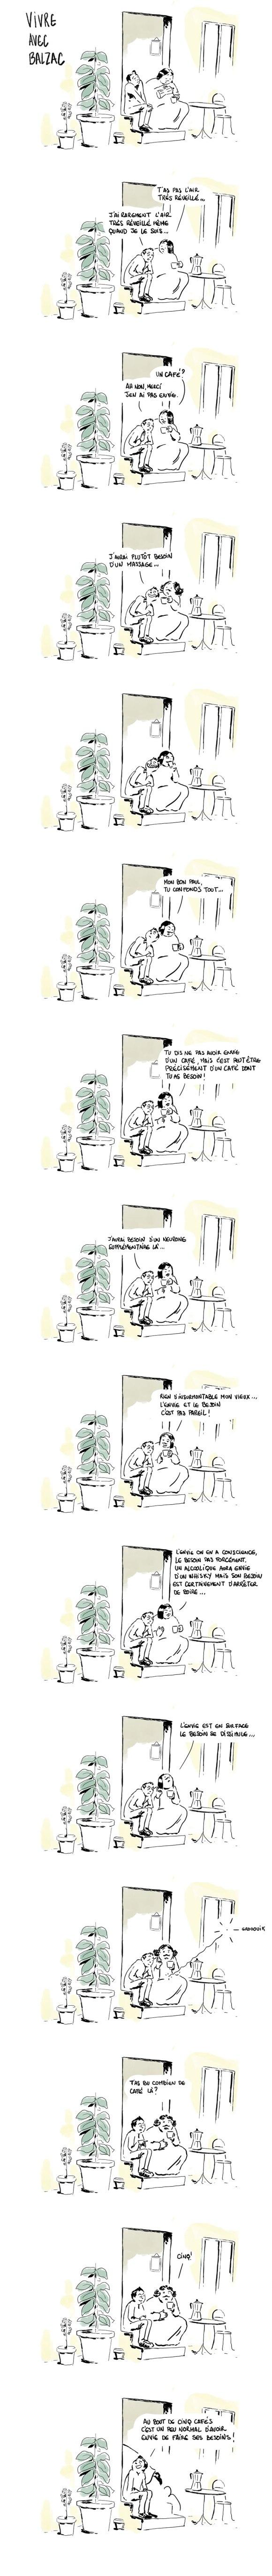 BALZAC-ENVIE_BESOIN